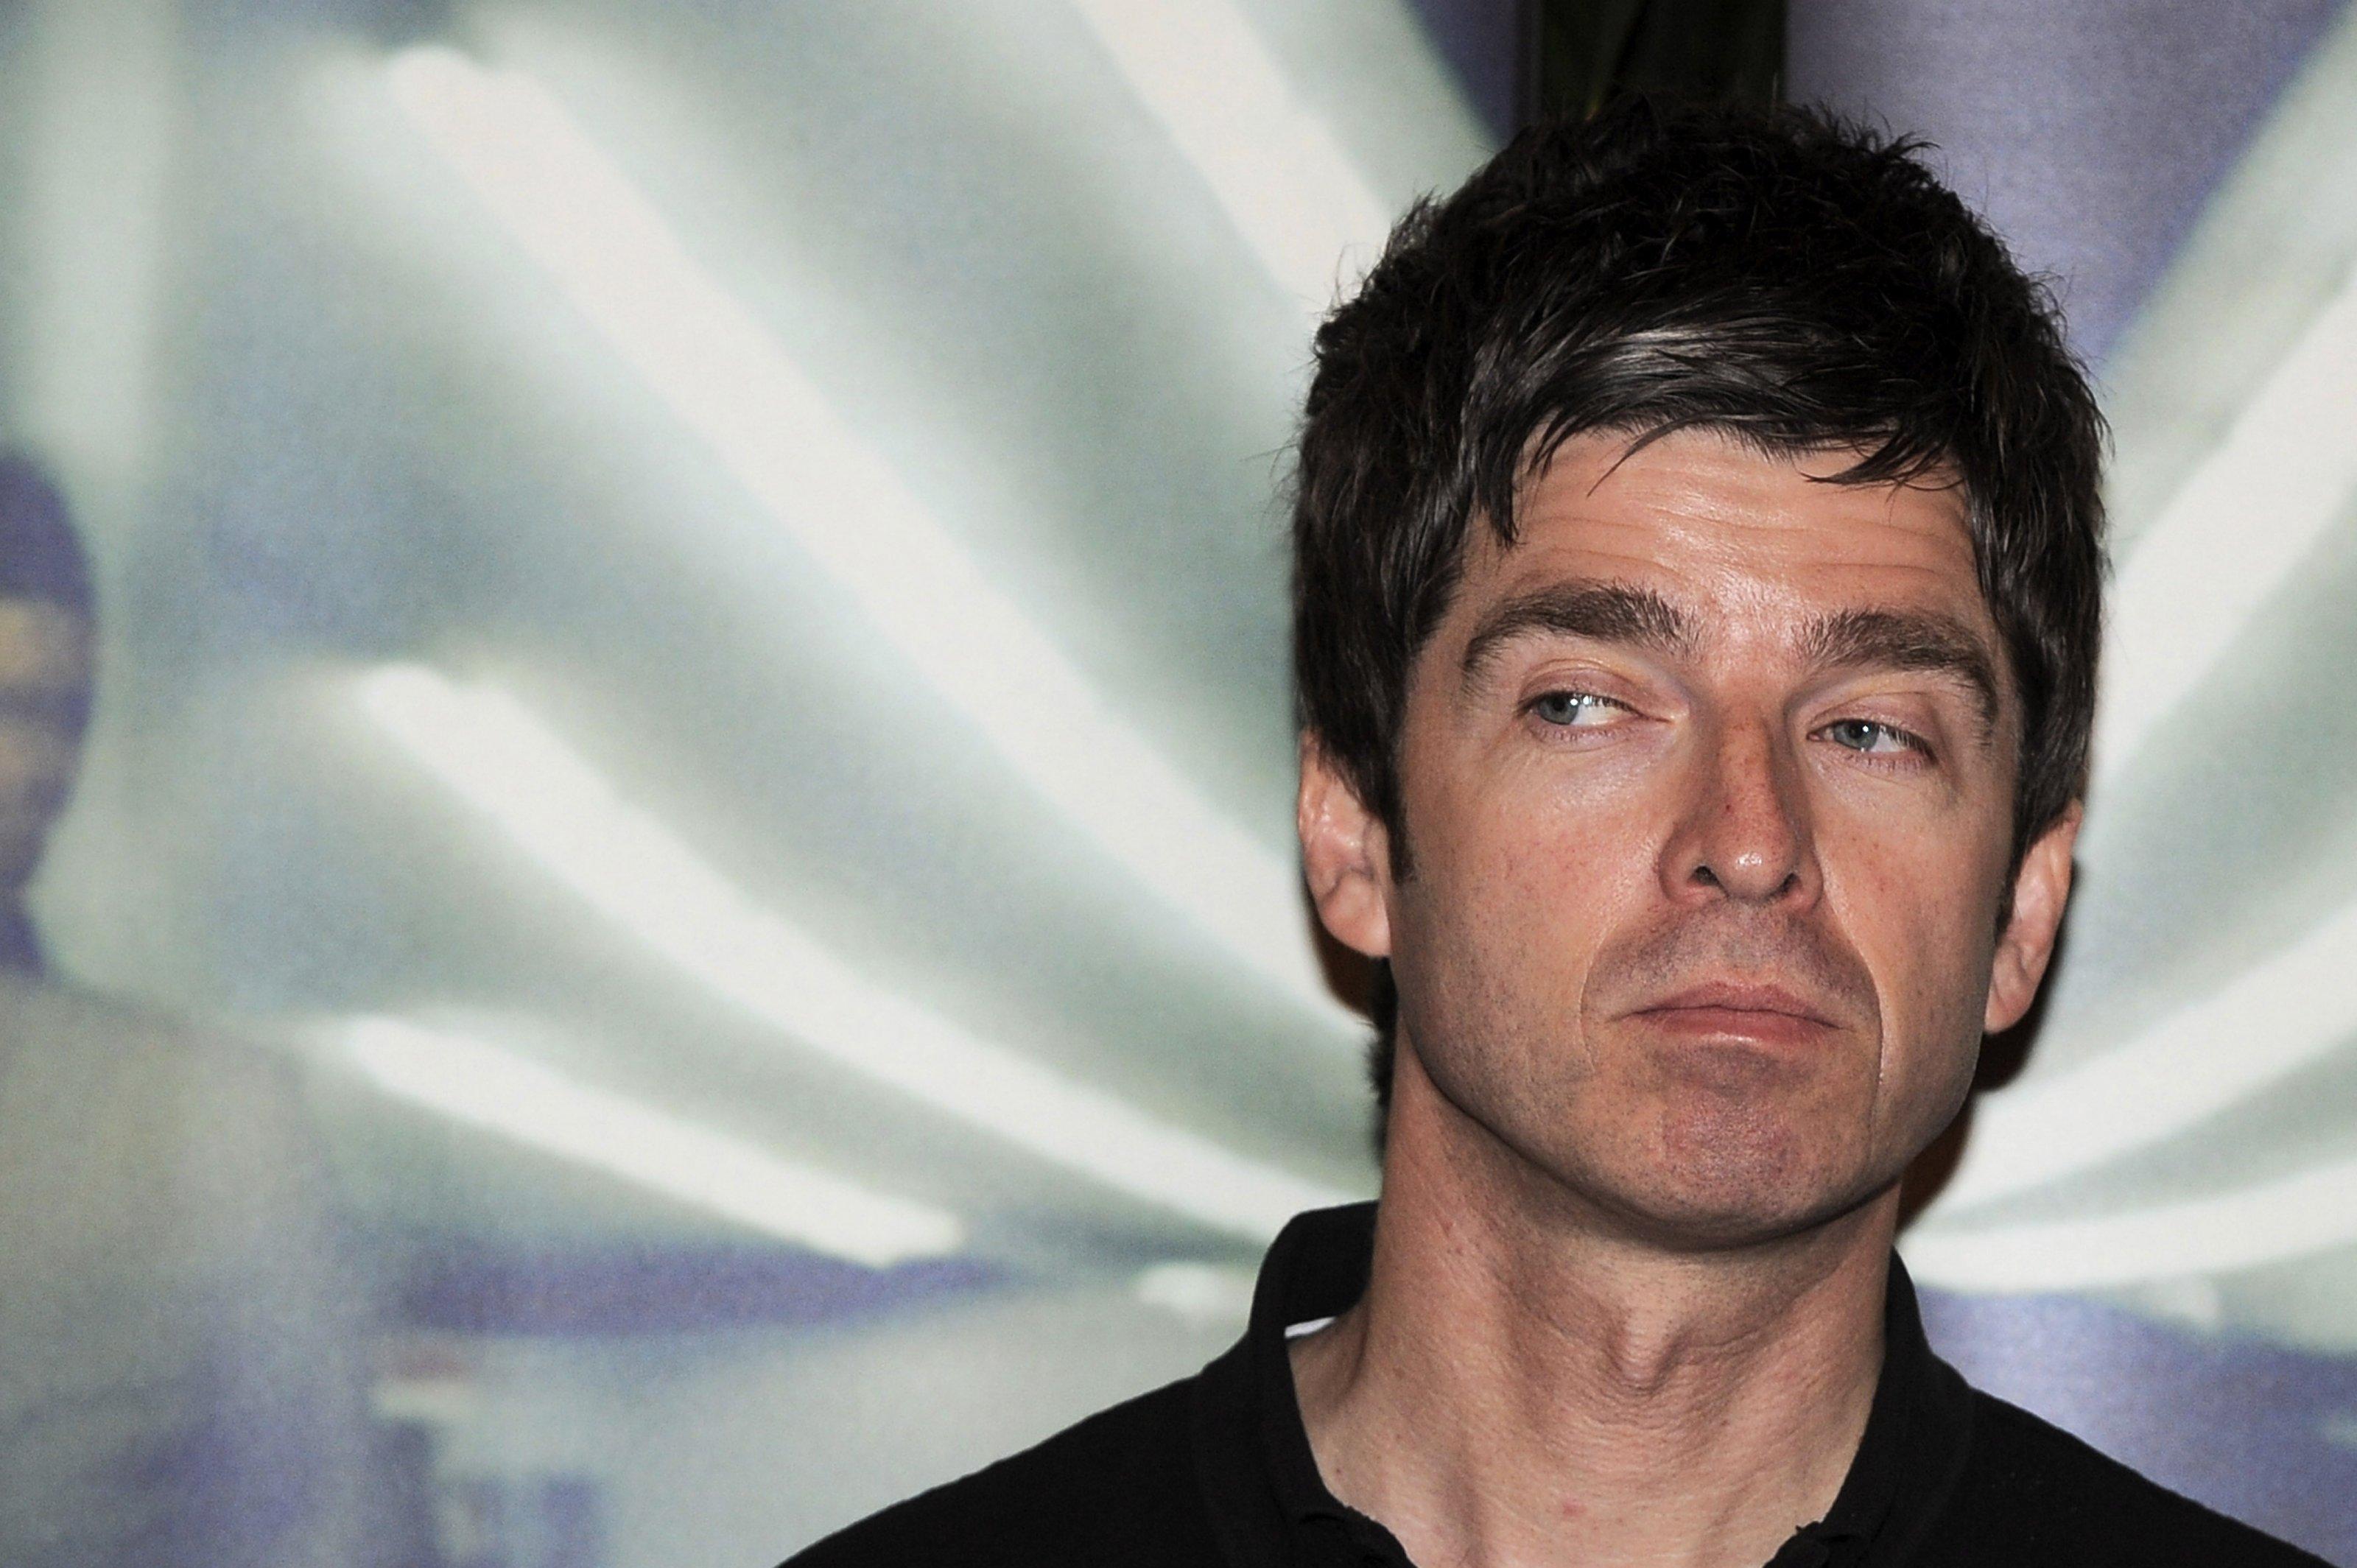 Noel Gallagher Computer Wallpaper